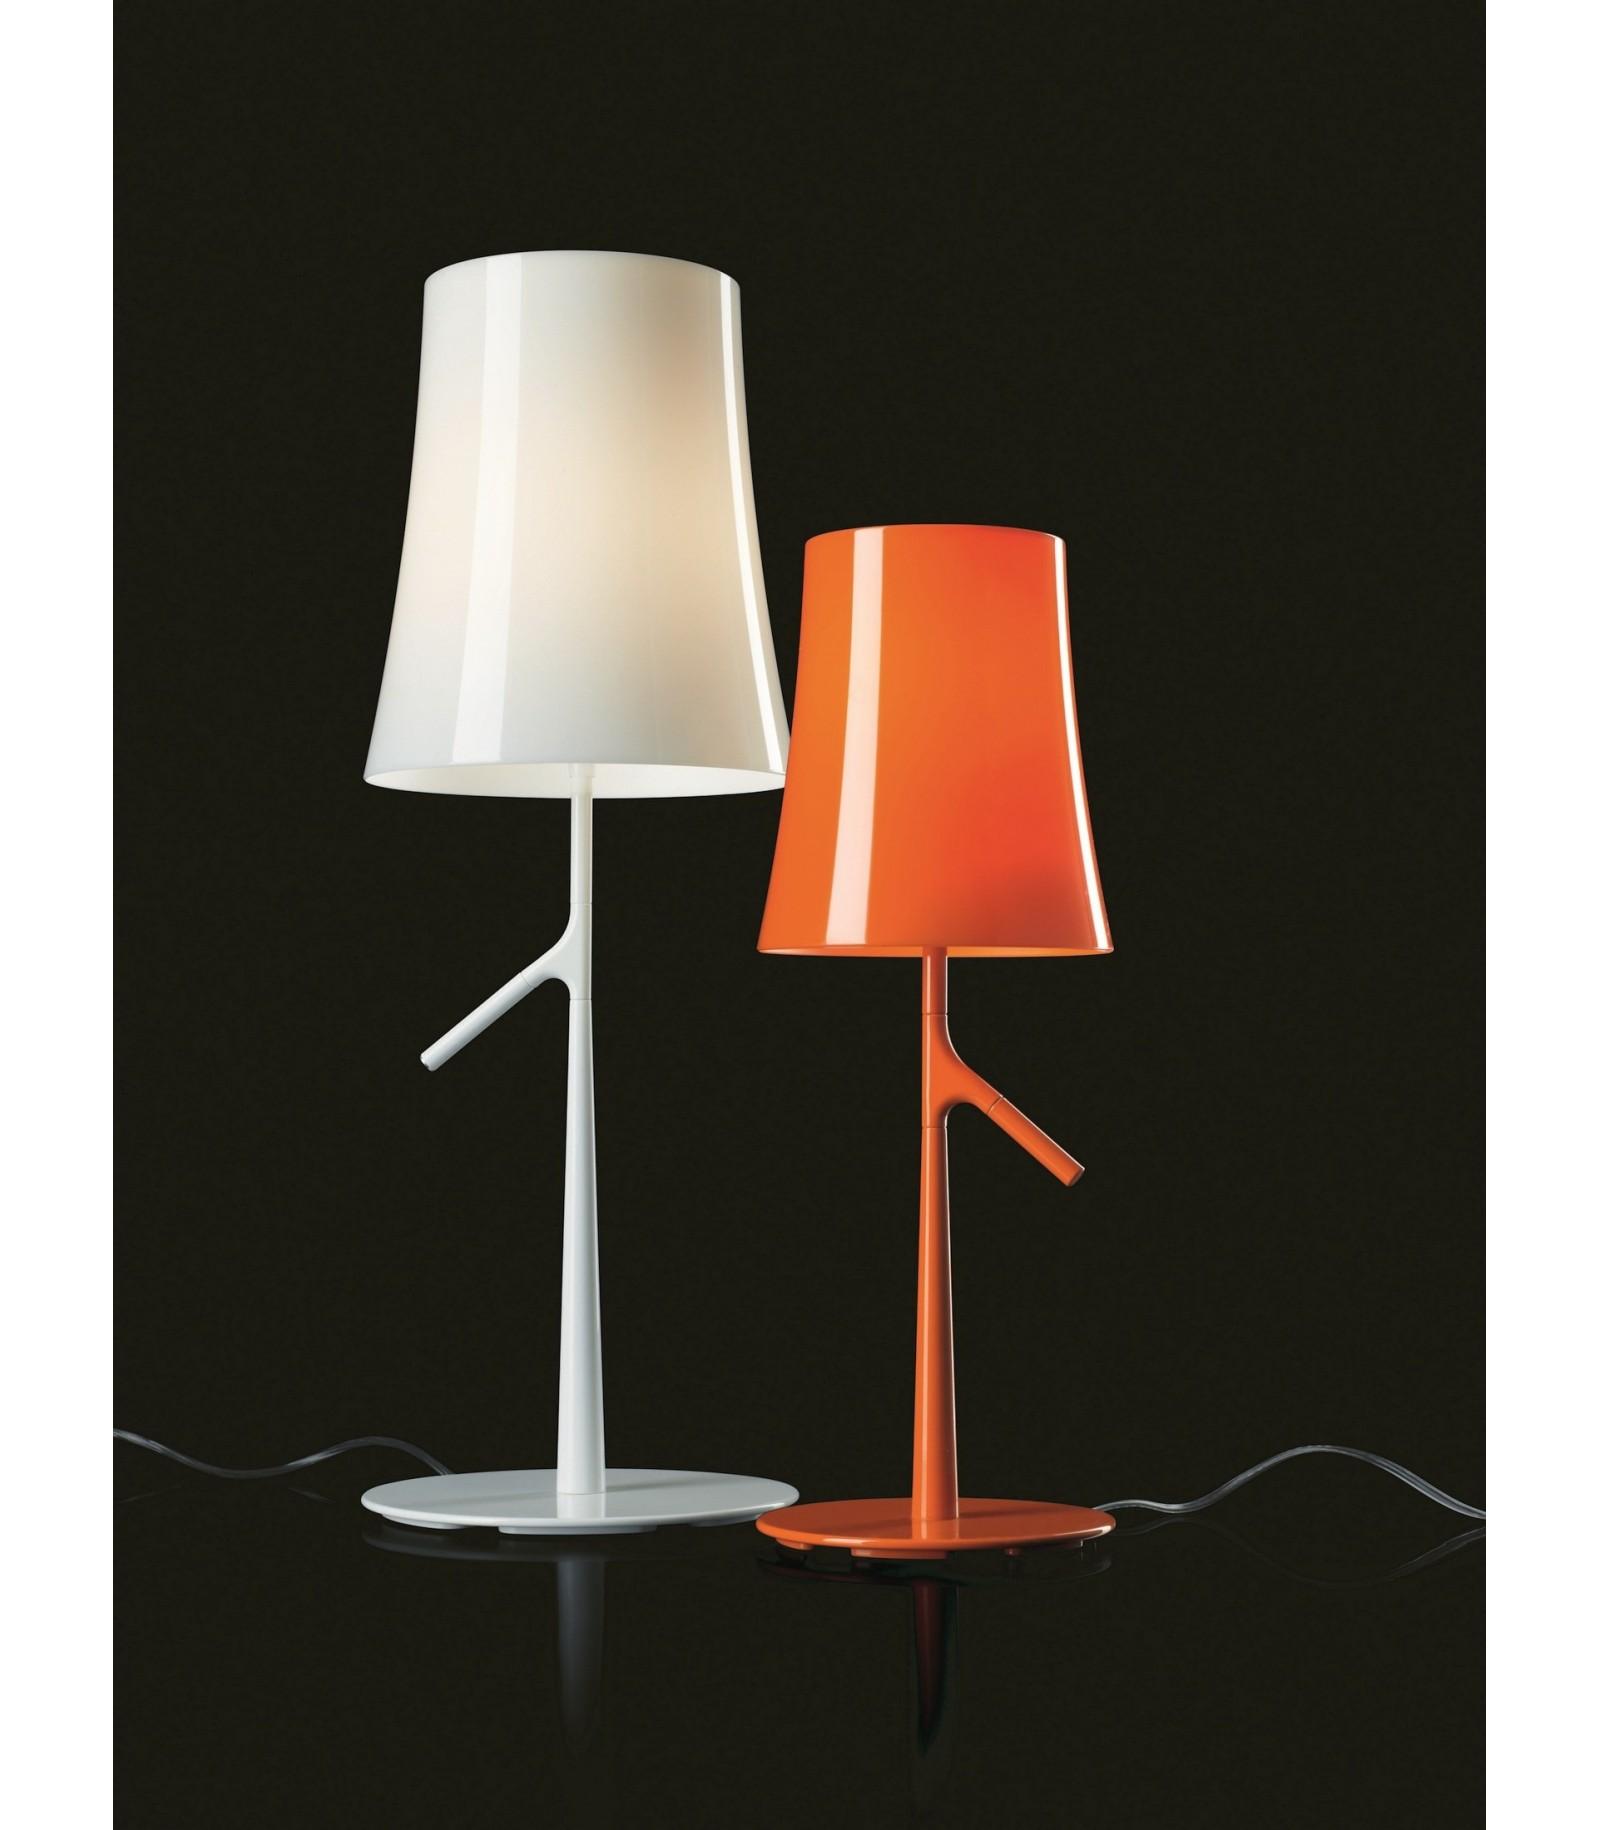 Lampada Birdie Foscarini.Lampada Da Tavolo Birdie Foscarini